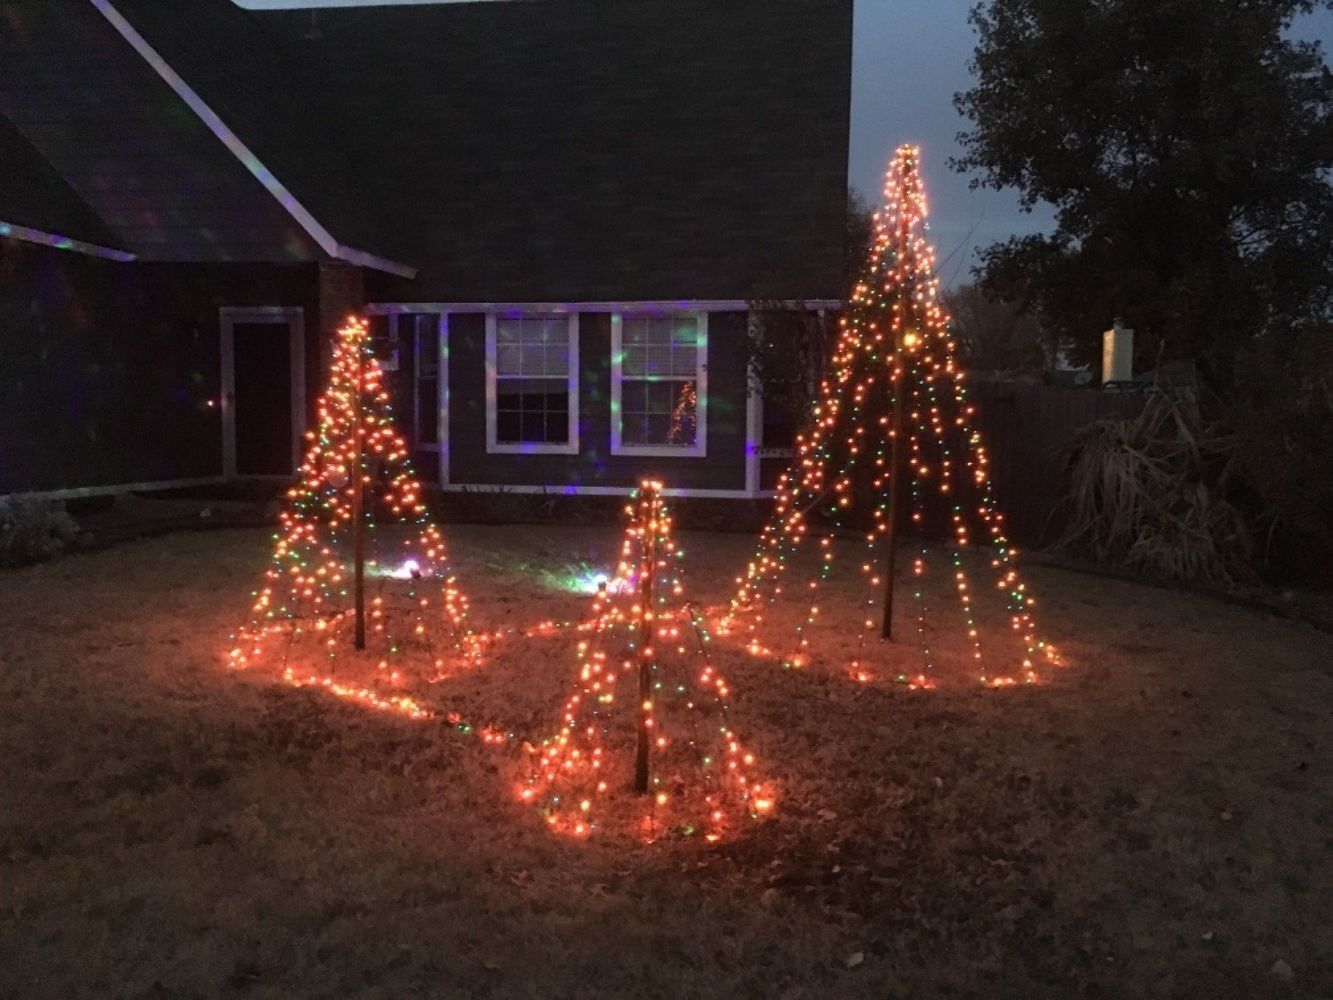 Diy Easy Christmas Tree Lights For Your Backyard Outdoor Christmas Tree Christmas Tree Lighting Simple Christmas Tree